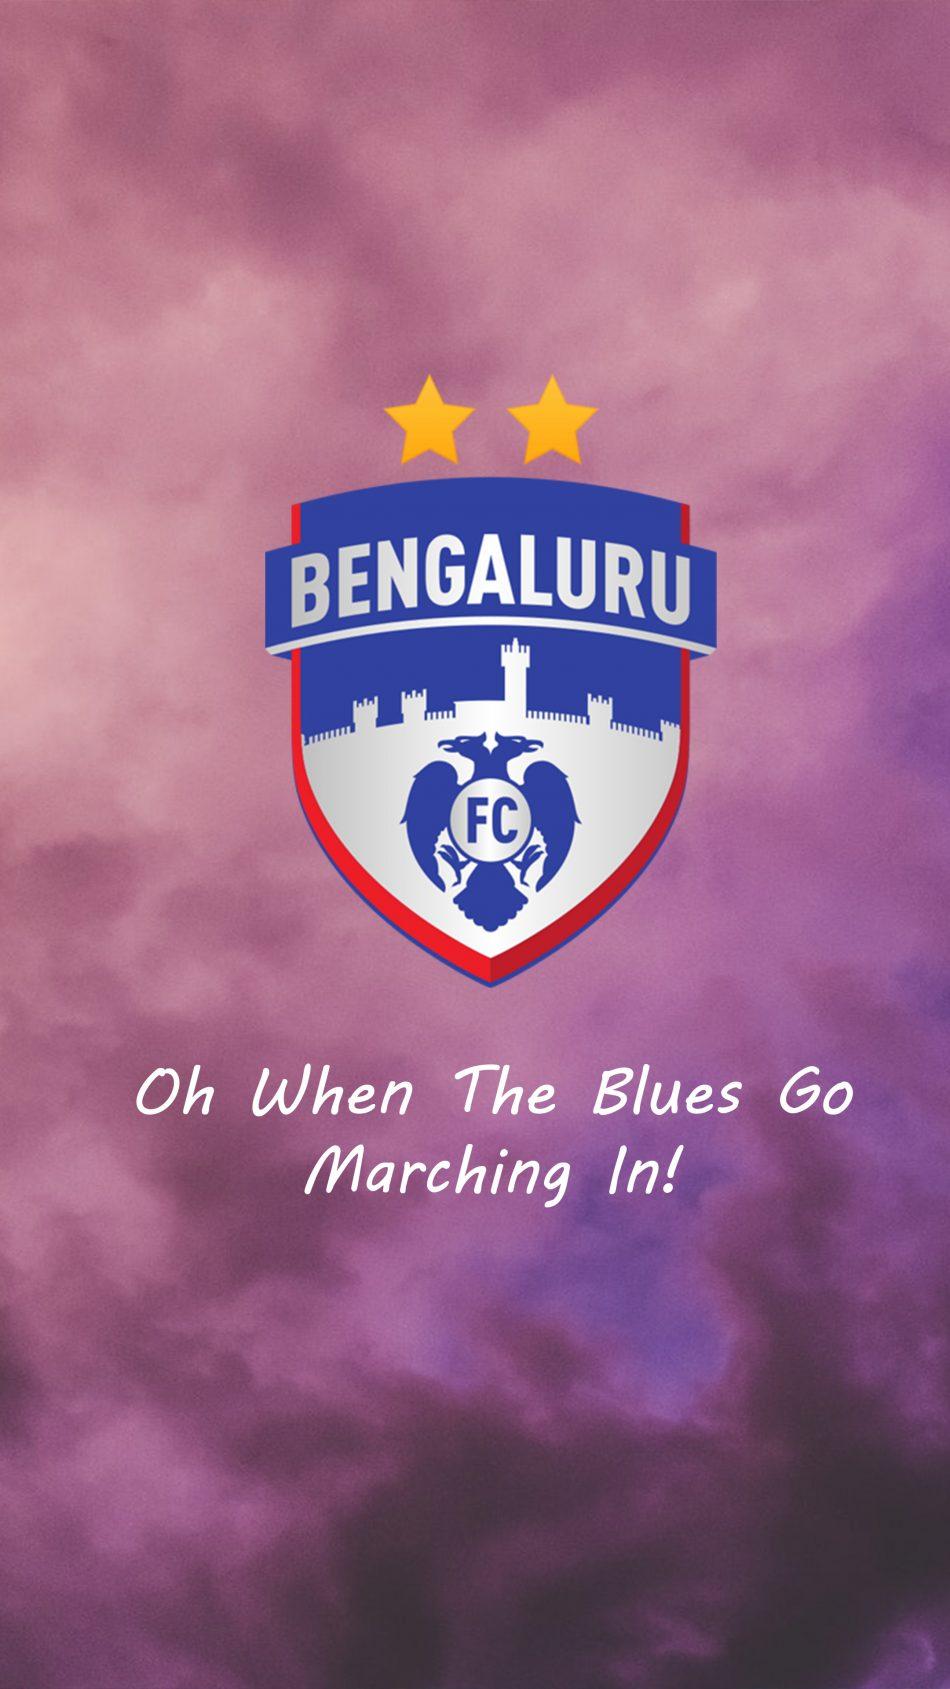 Bengaluru FC 4K Ultra HD Mobile Wallpaper